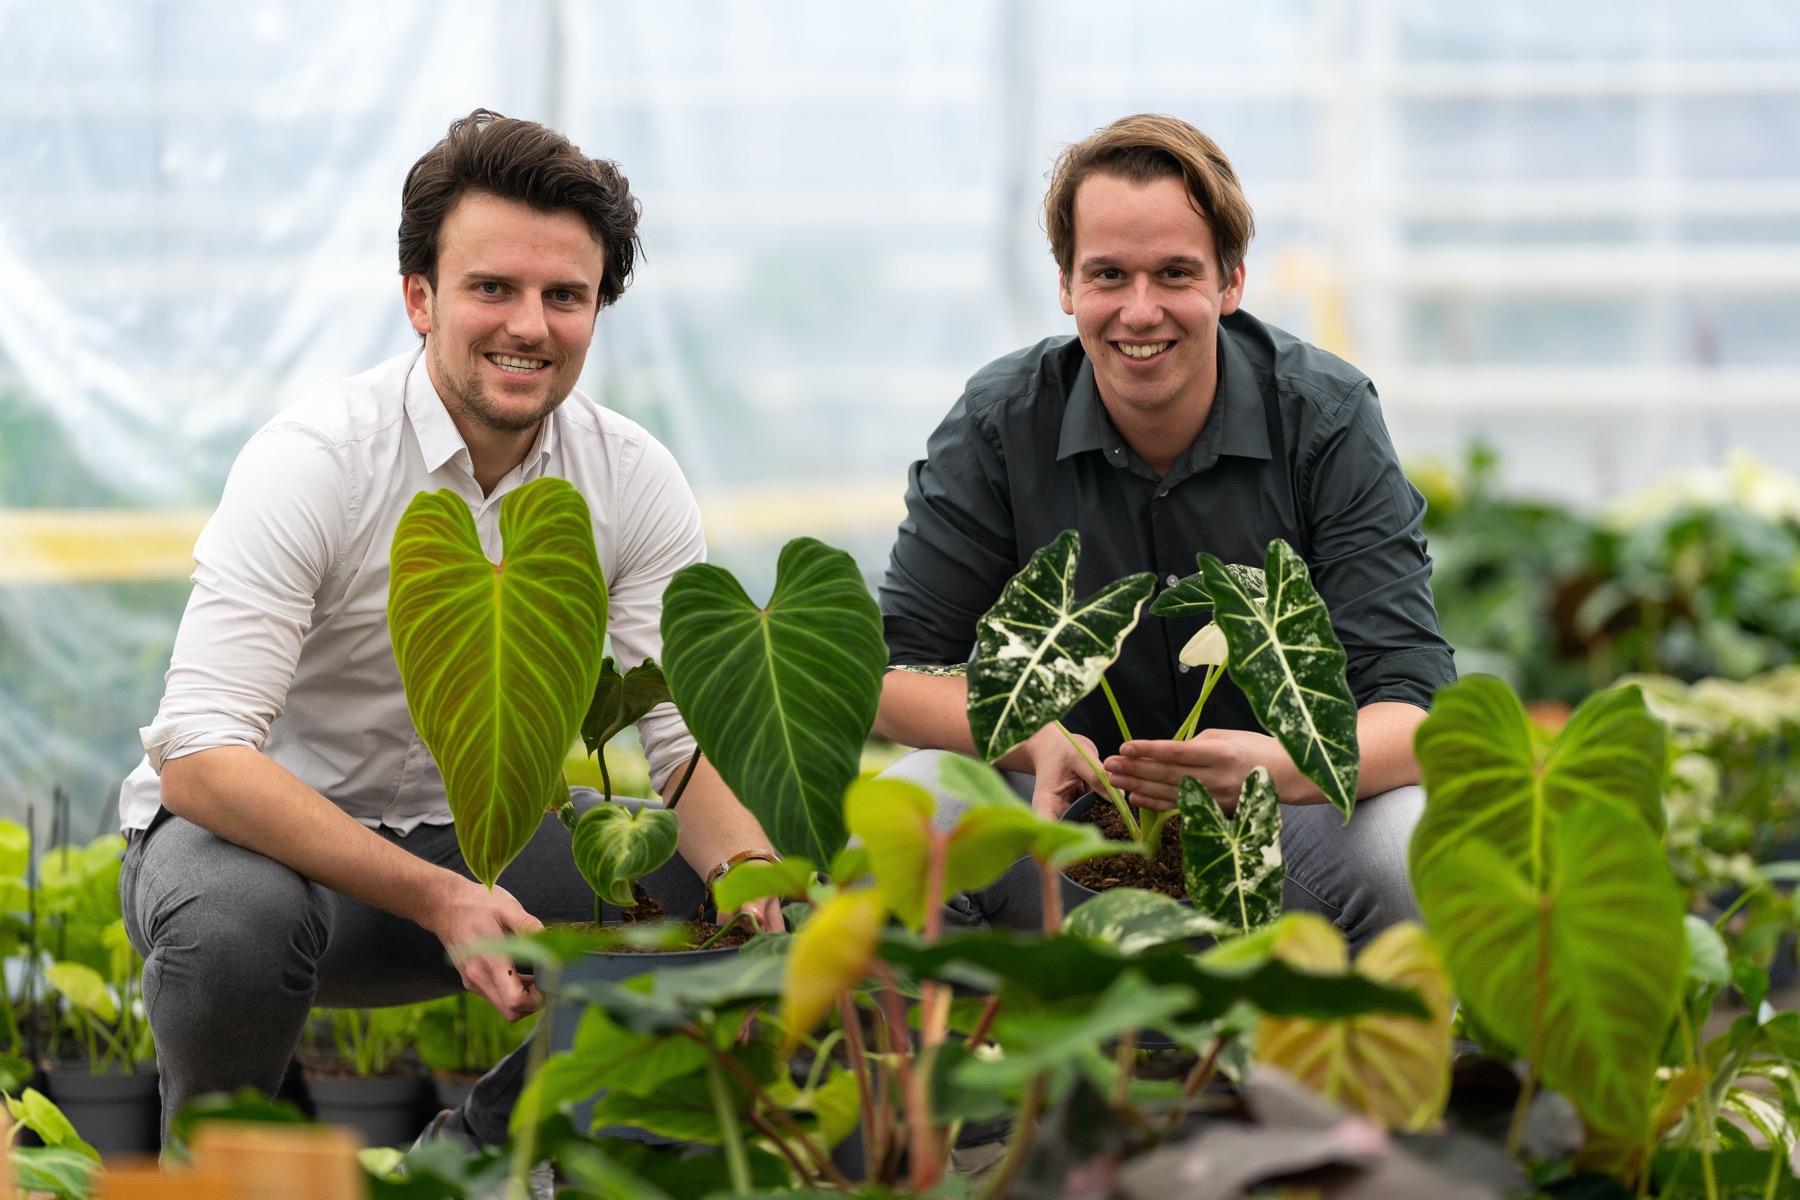 Team Planthunters